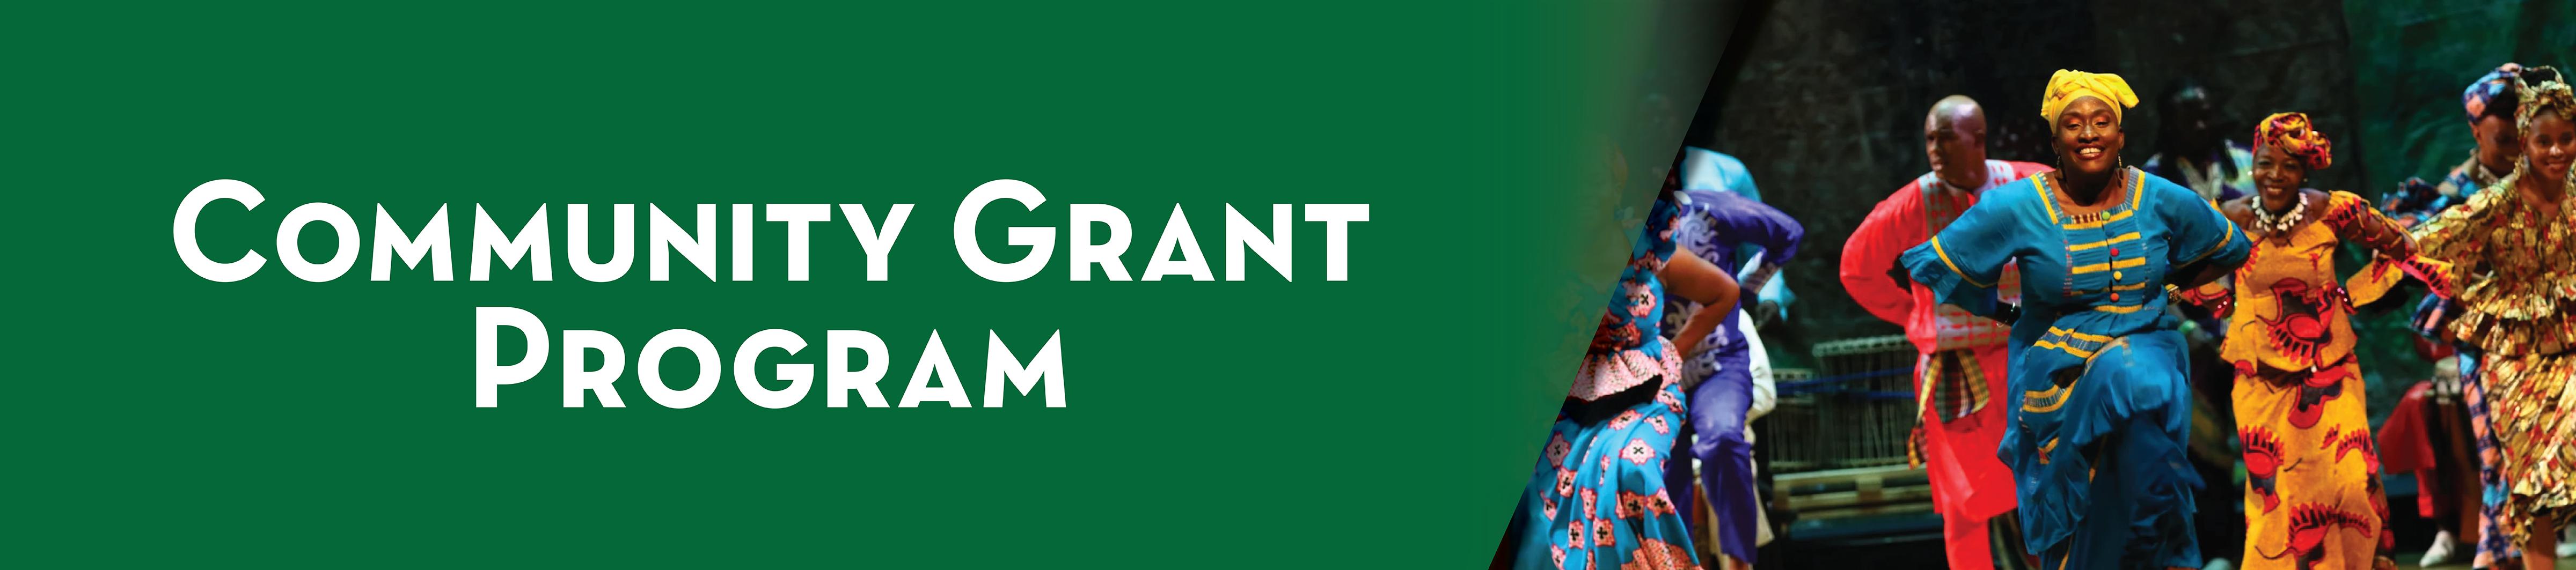 Community Grant Program